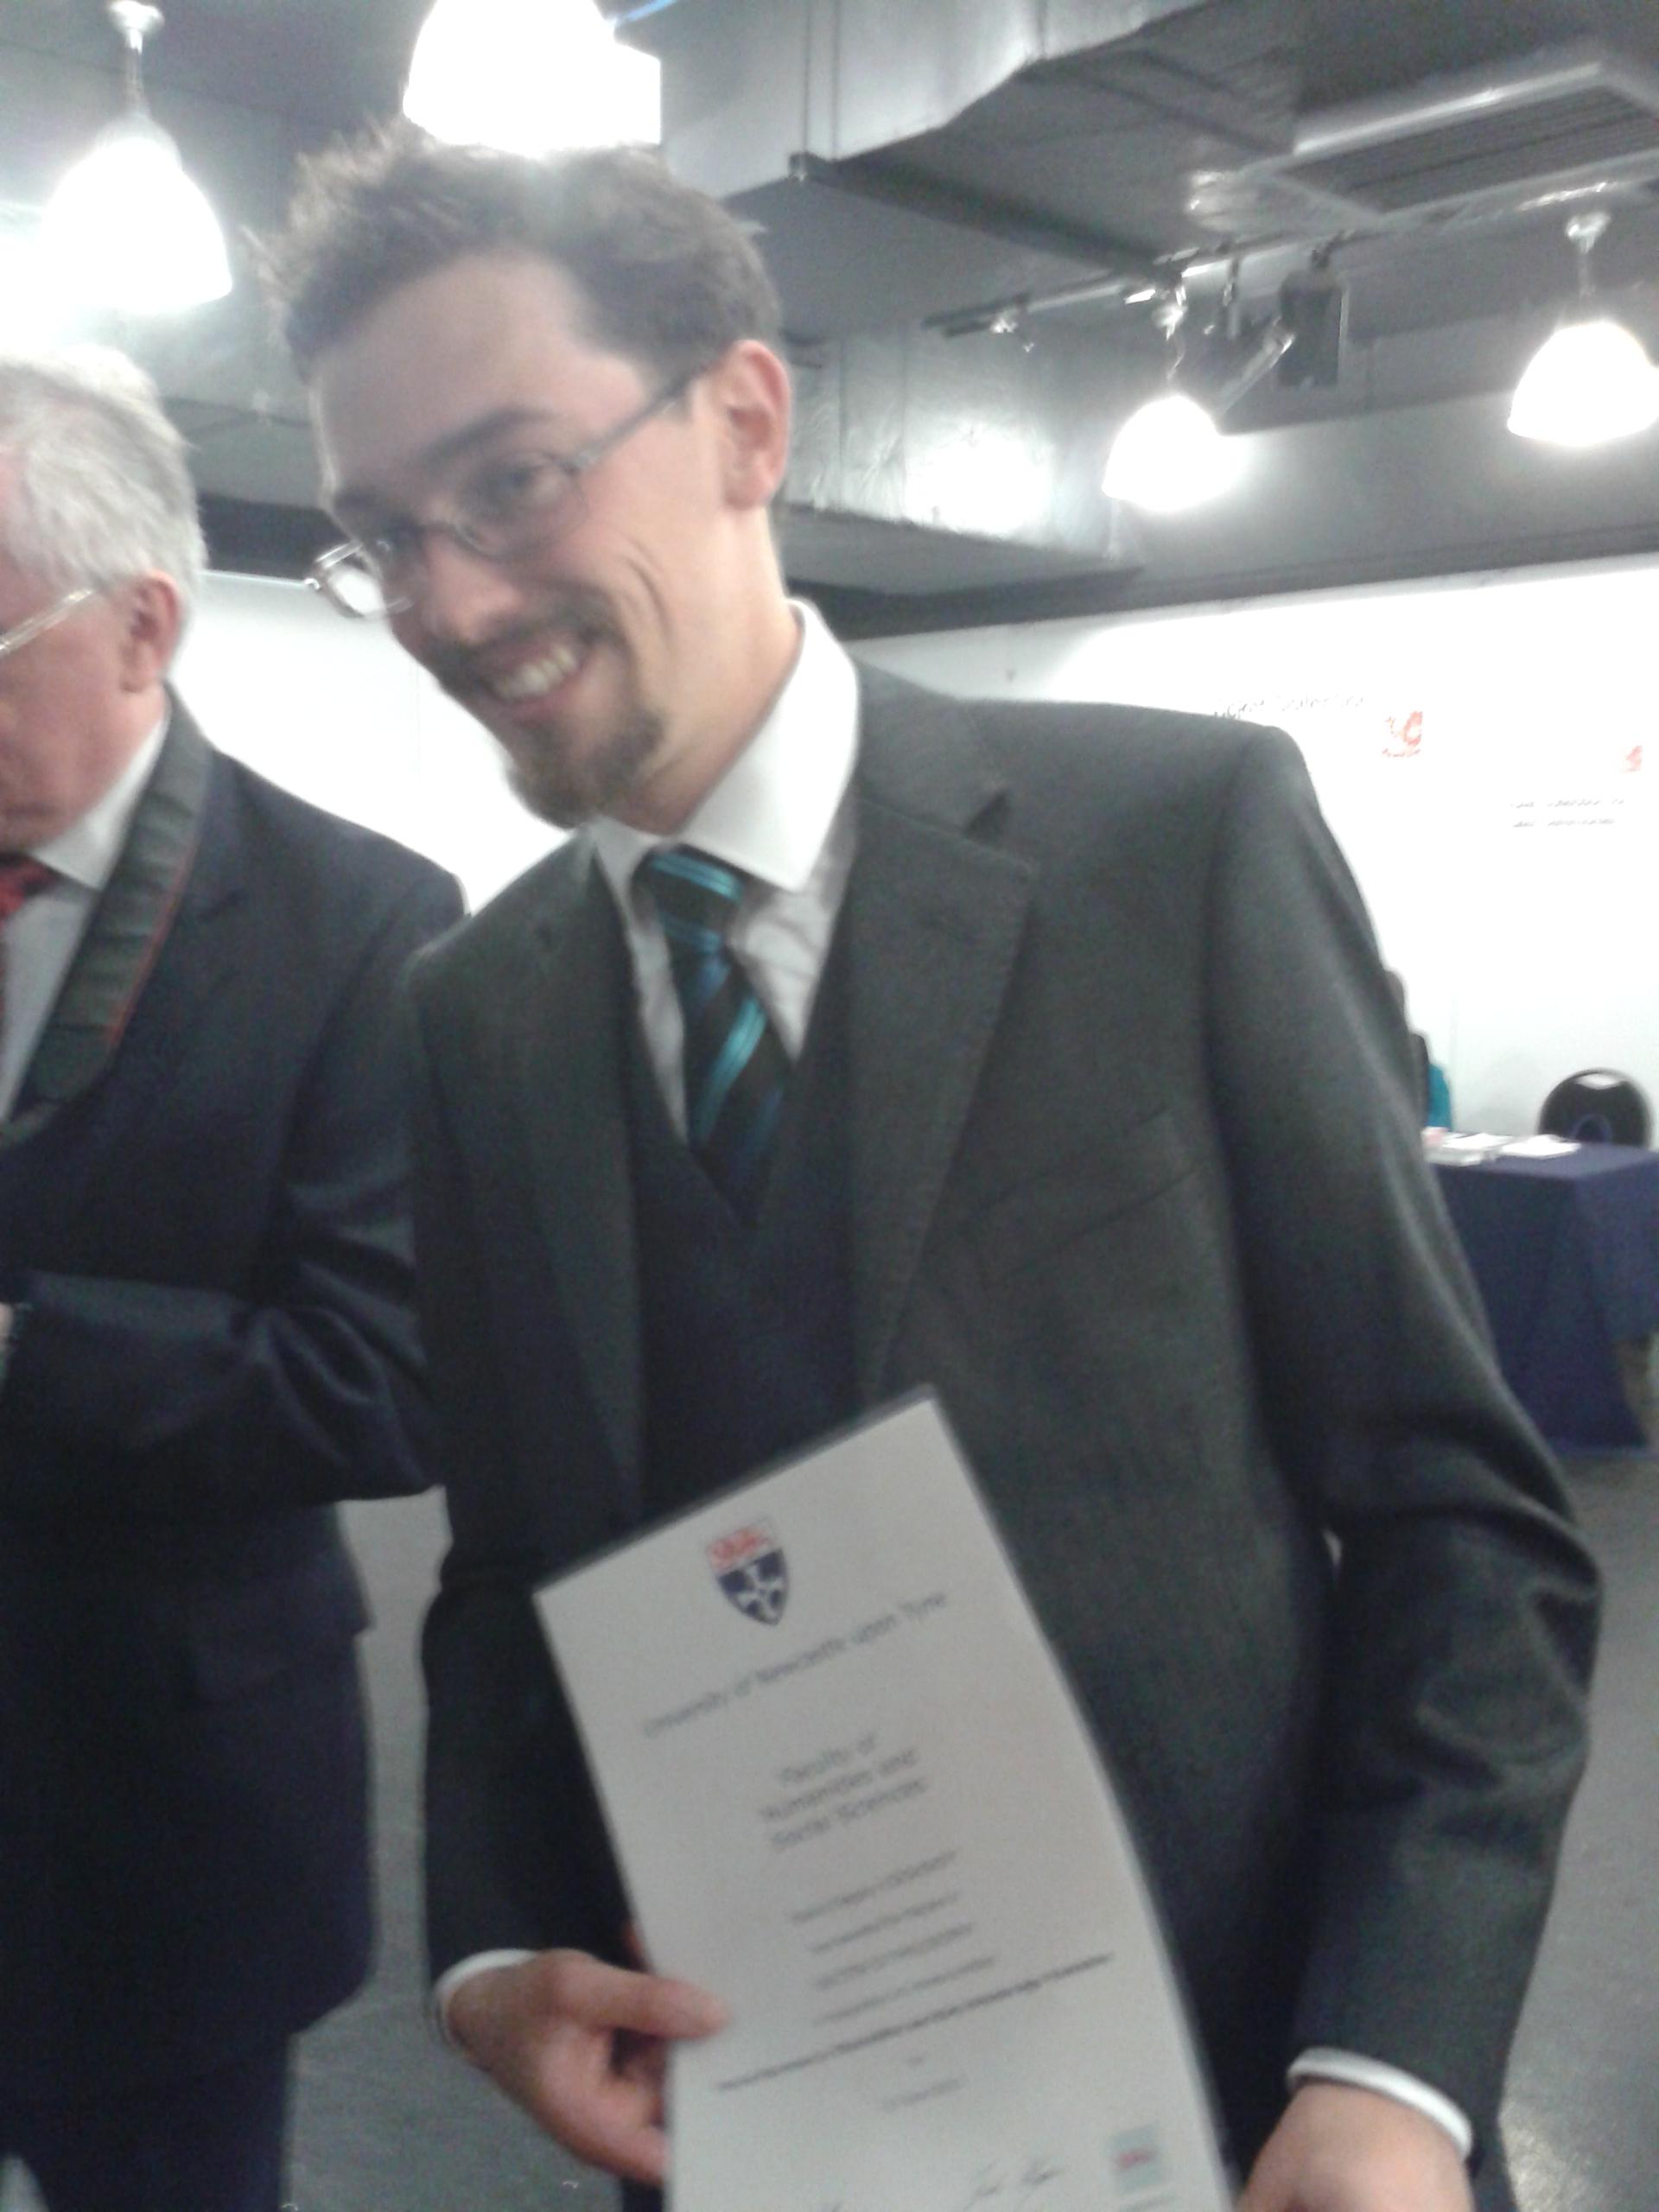 David Cockcroft - PhD Archaeology - Subject Matter Expert from Kolabtree